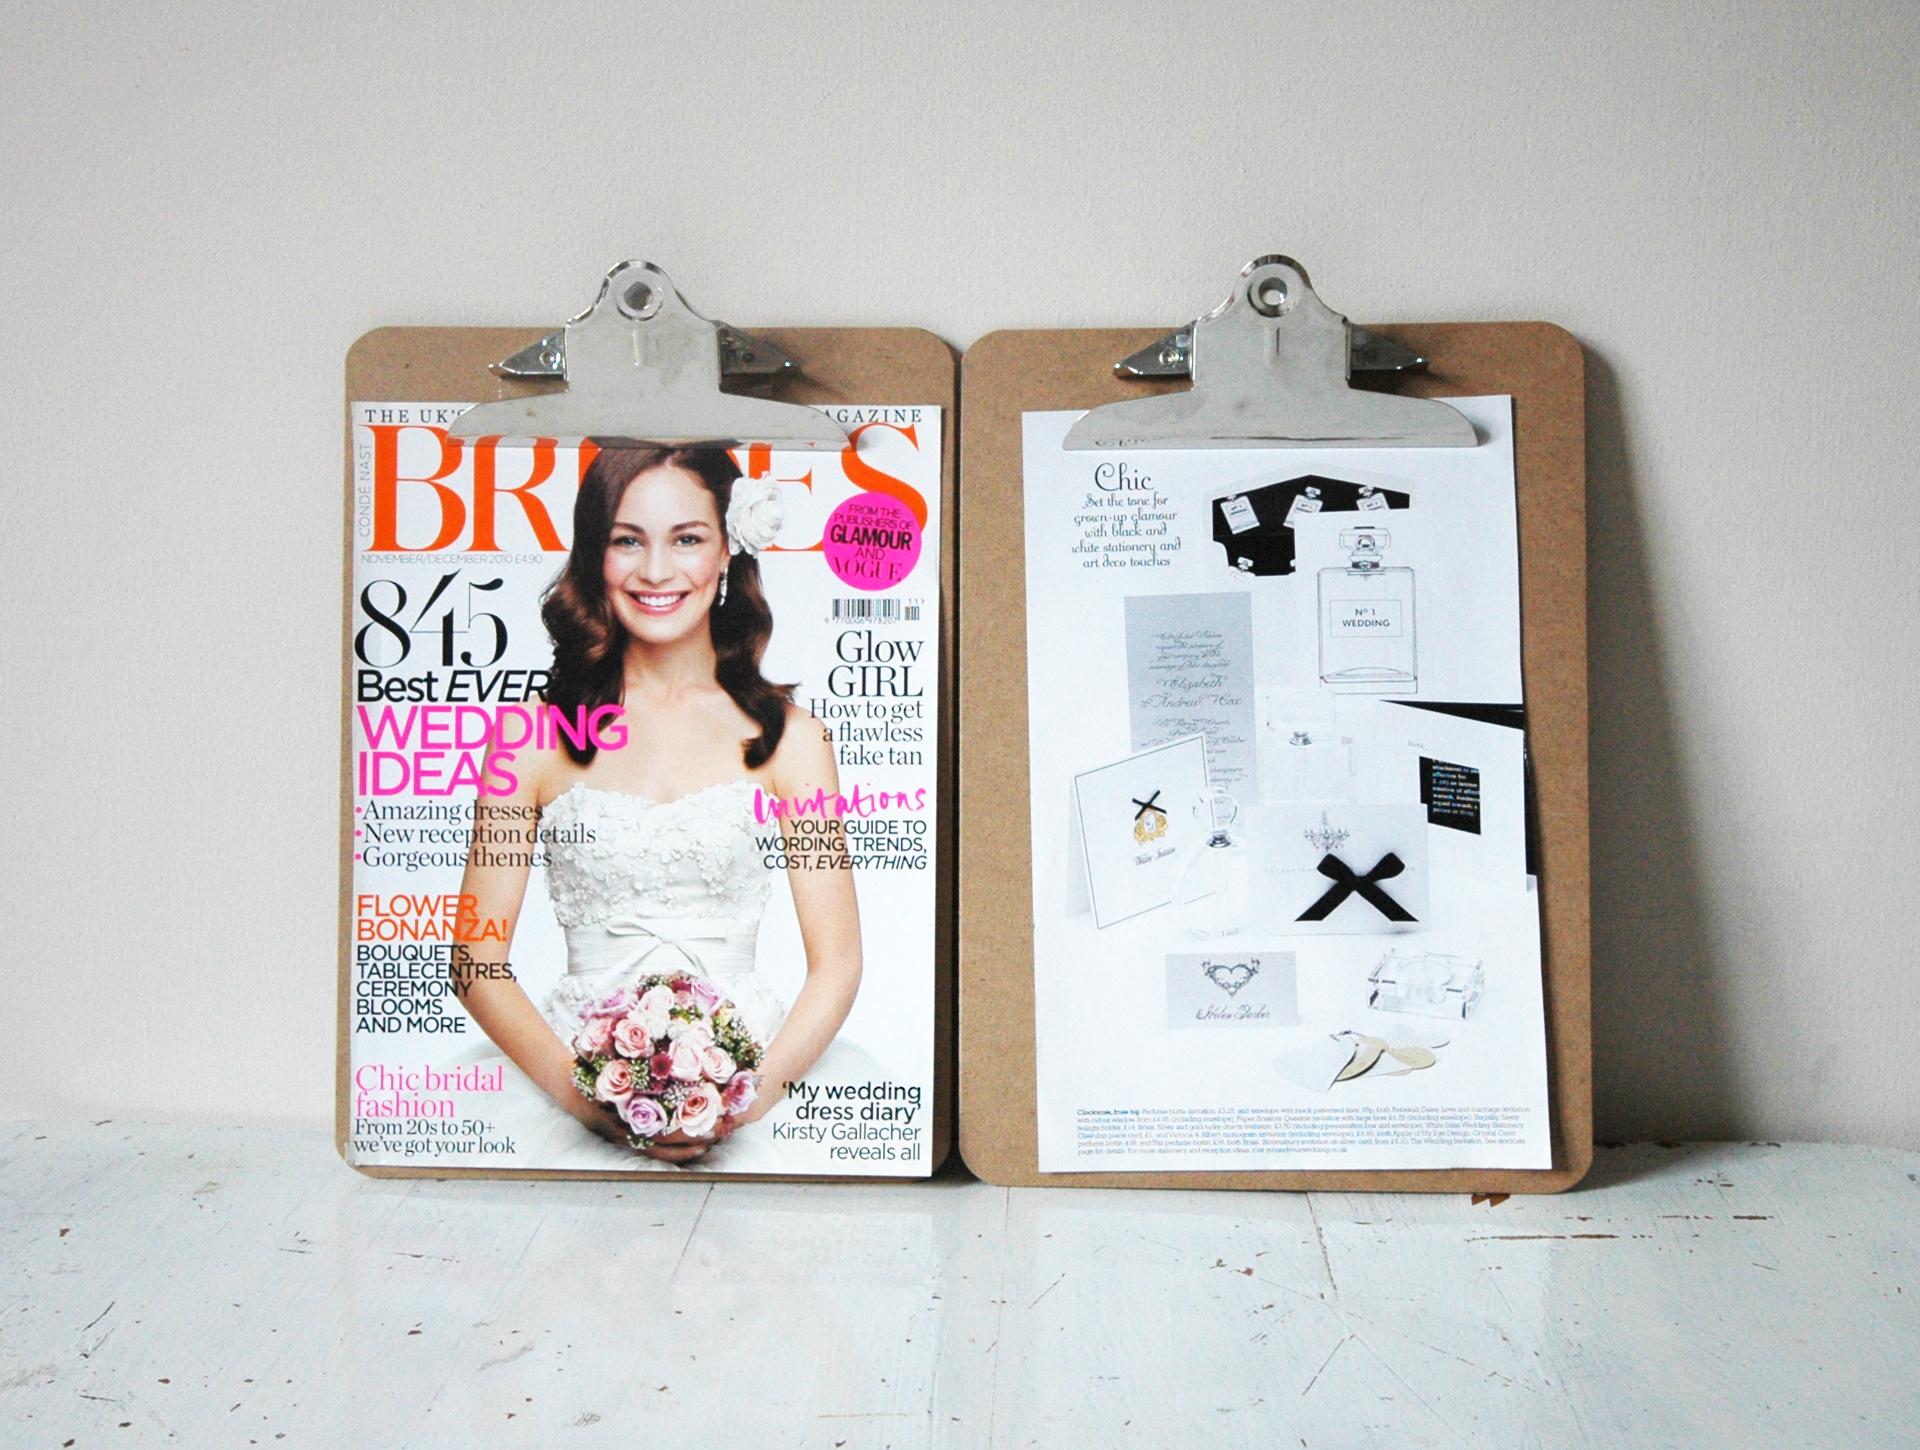 featured in Brides Magazine...